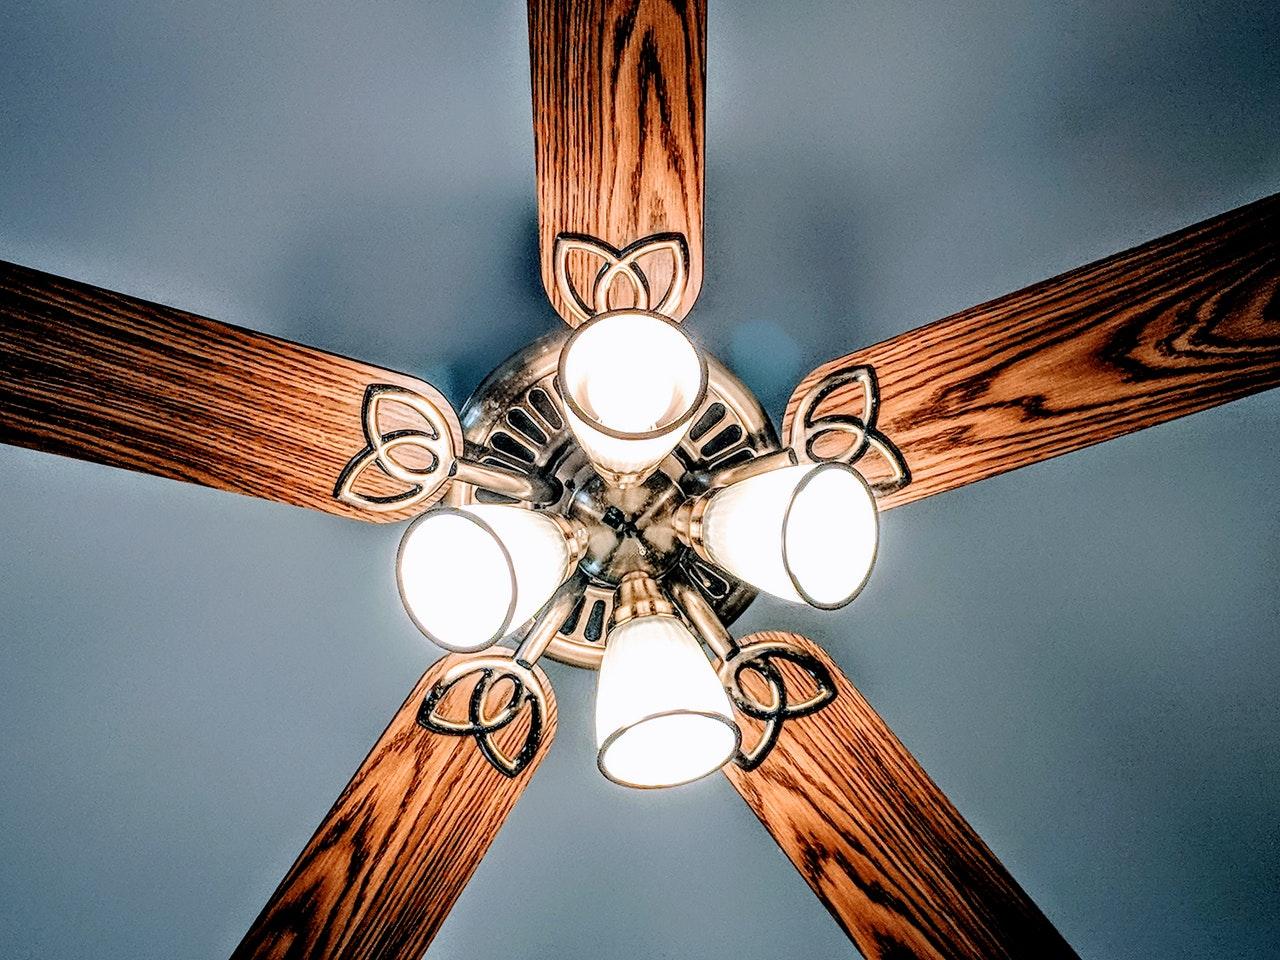 art ceiling fan color